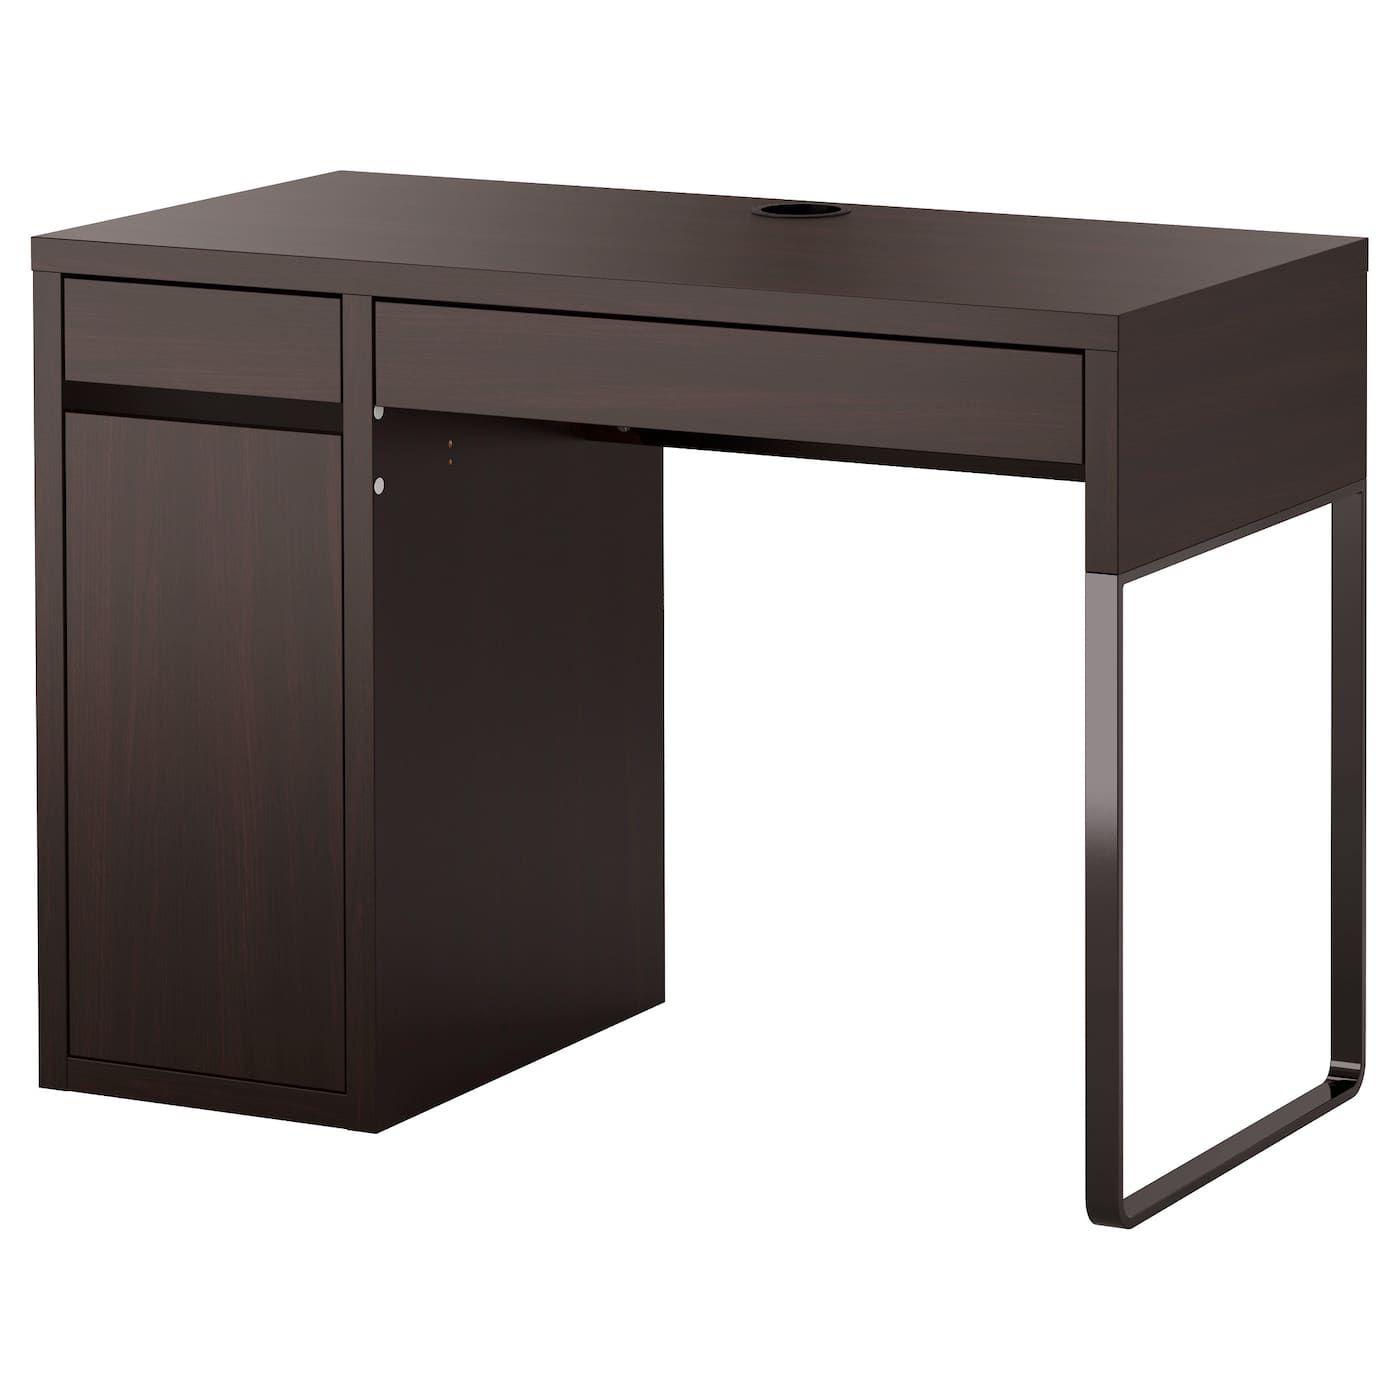 Micke Nakupte Zde Psaci Stulcernohneda 105x50 Cm Ikea Ikea Micke Desk Micke Desk Ikea Micke